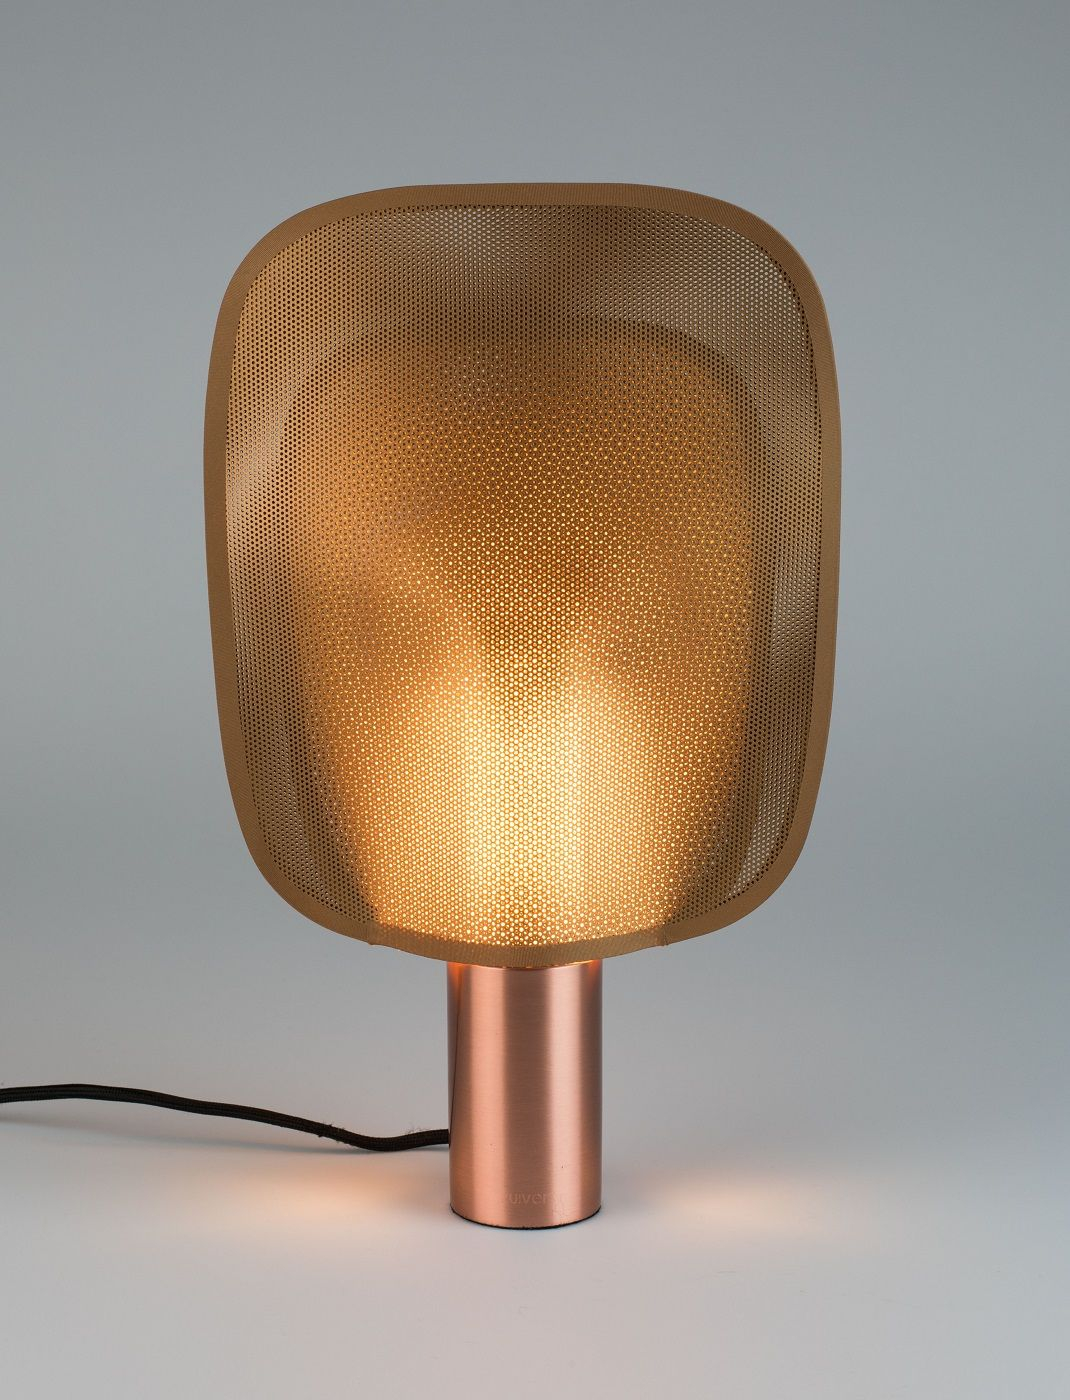 Zuiver Mai S Bordlampe - Kobber